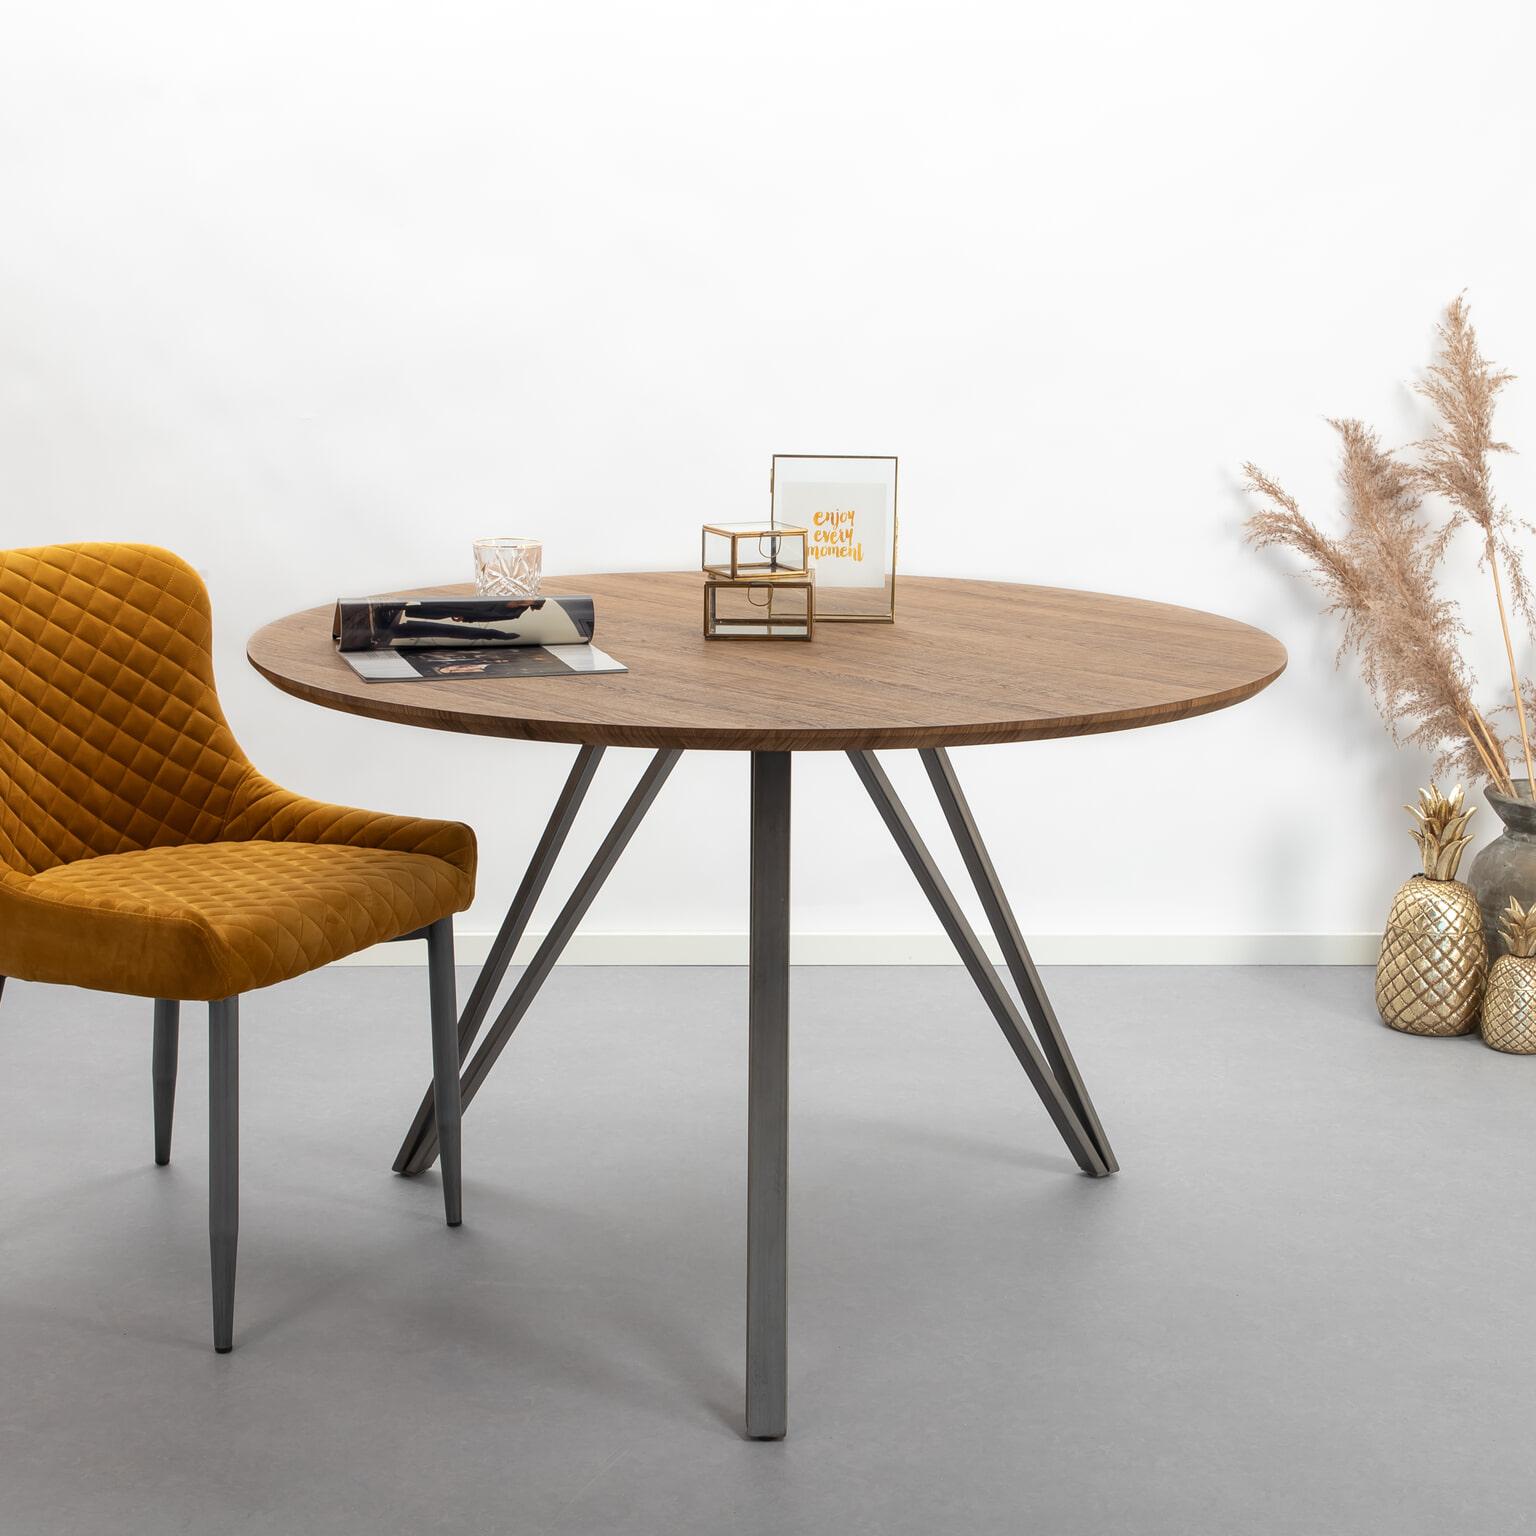 Ronde Eettafel Design.Industriele Ronde Eettafel Judy 120cm 3d Eikenlook Brownwash